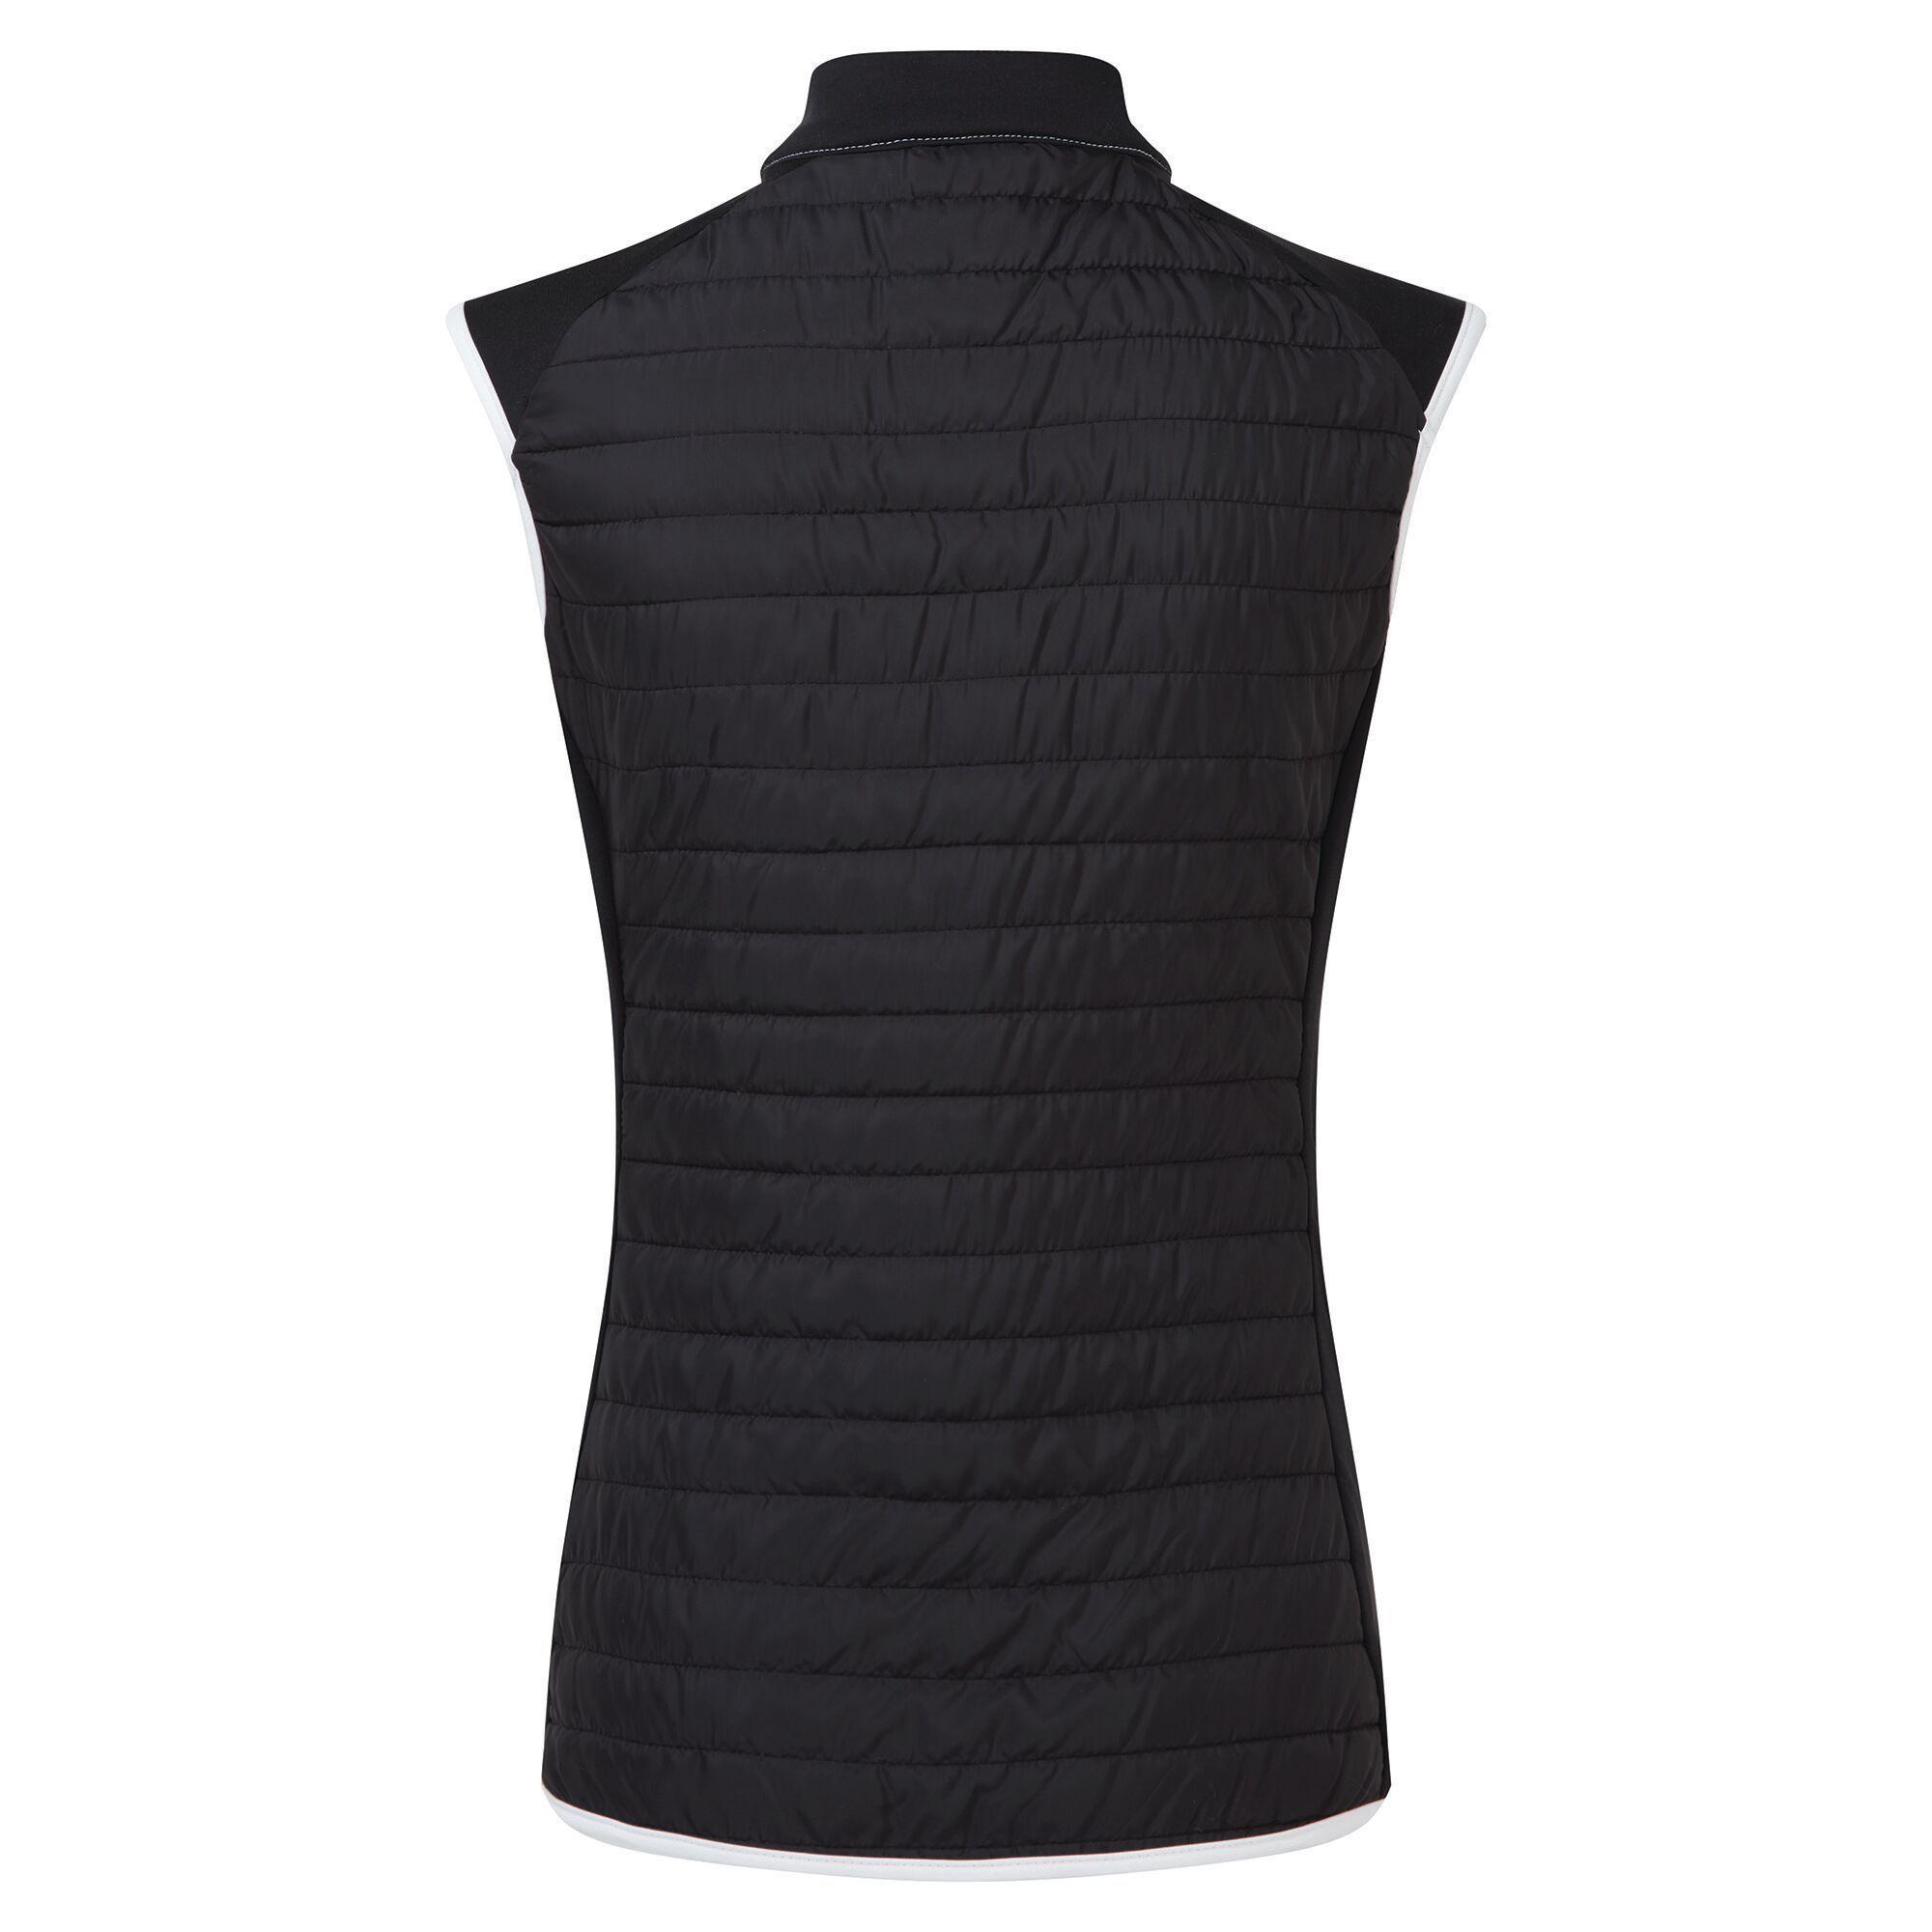 Dare 2B Womens/Ladies Surmount Body Warmer (Black/Active Pink/White)